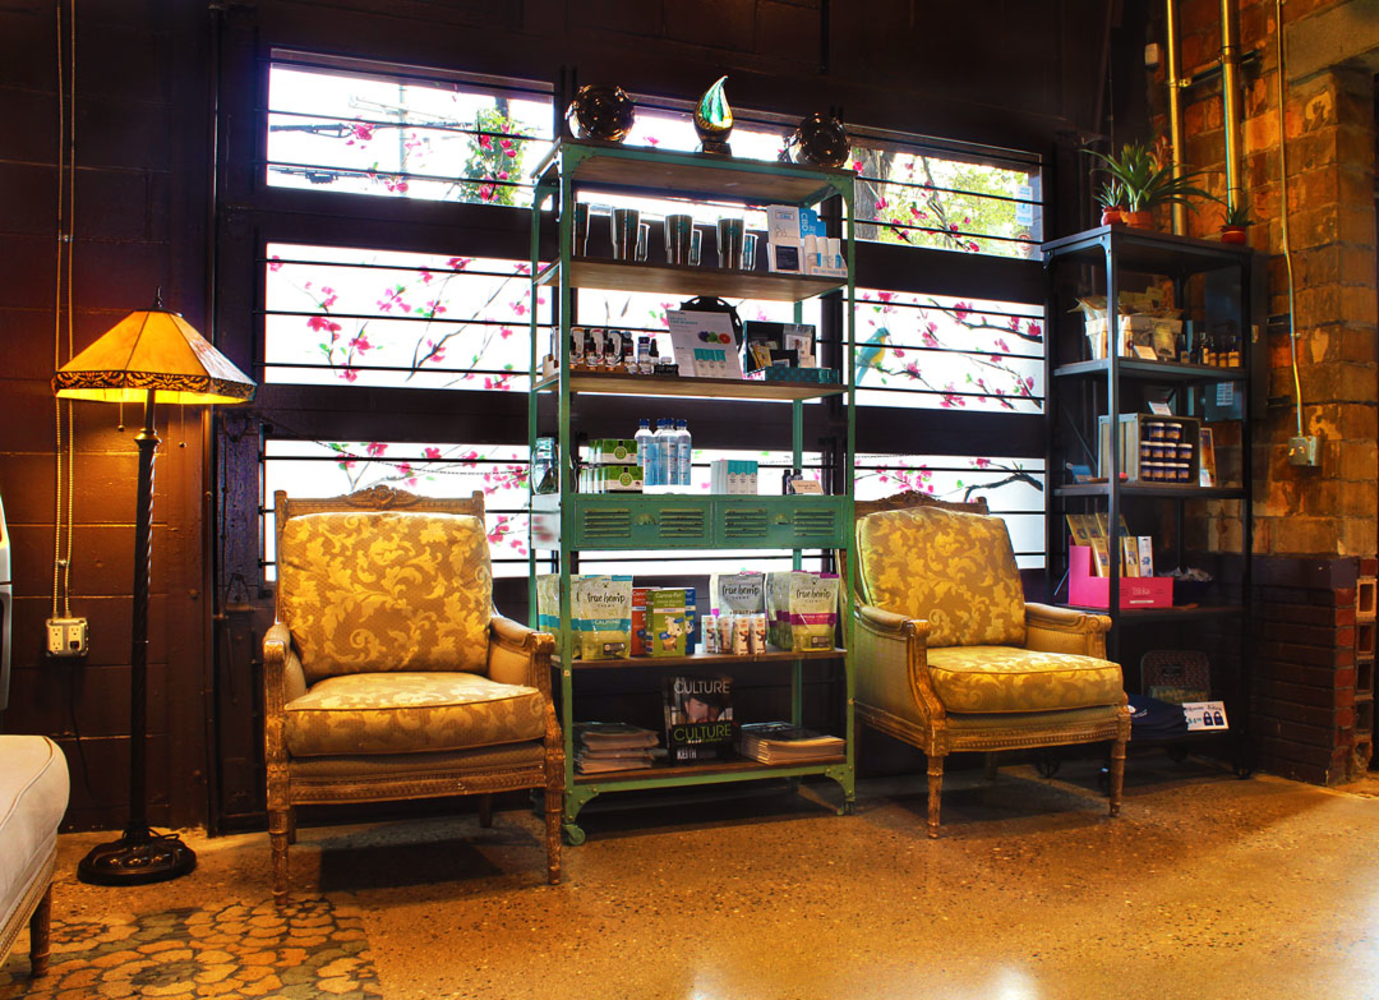 Bloom City Club Medical/Recreational Marijuana Dispensary Ann Arbor